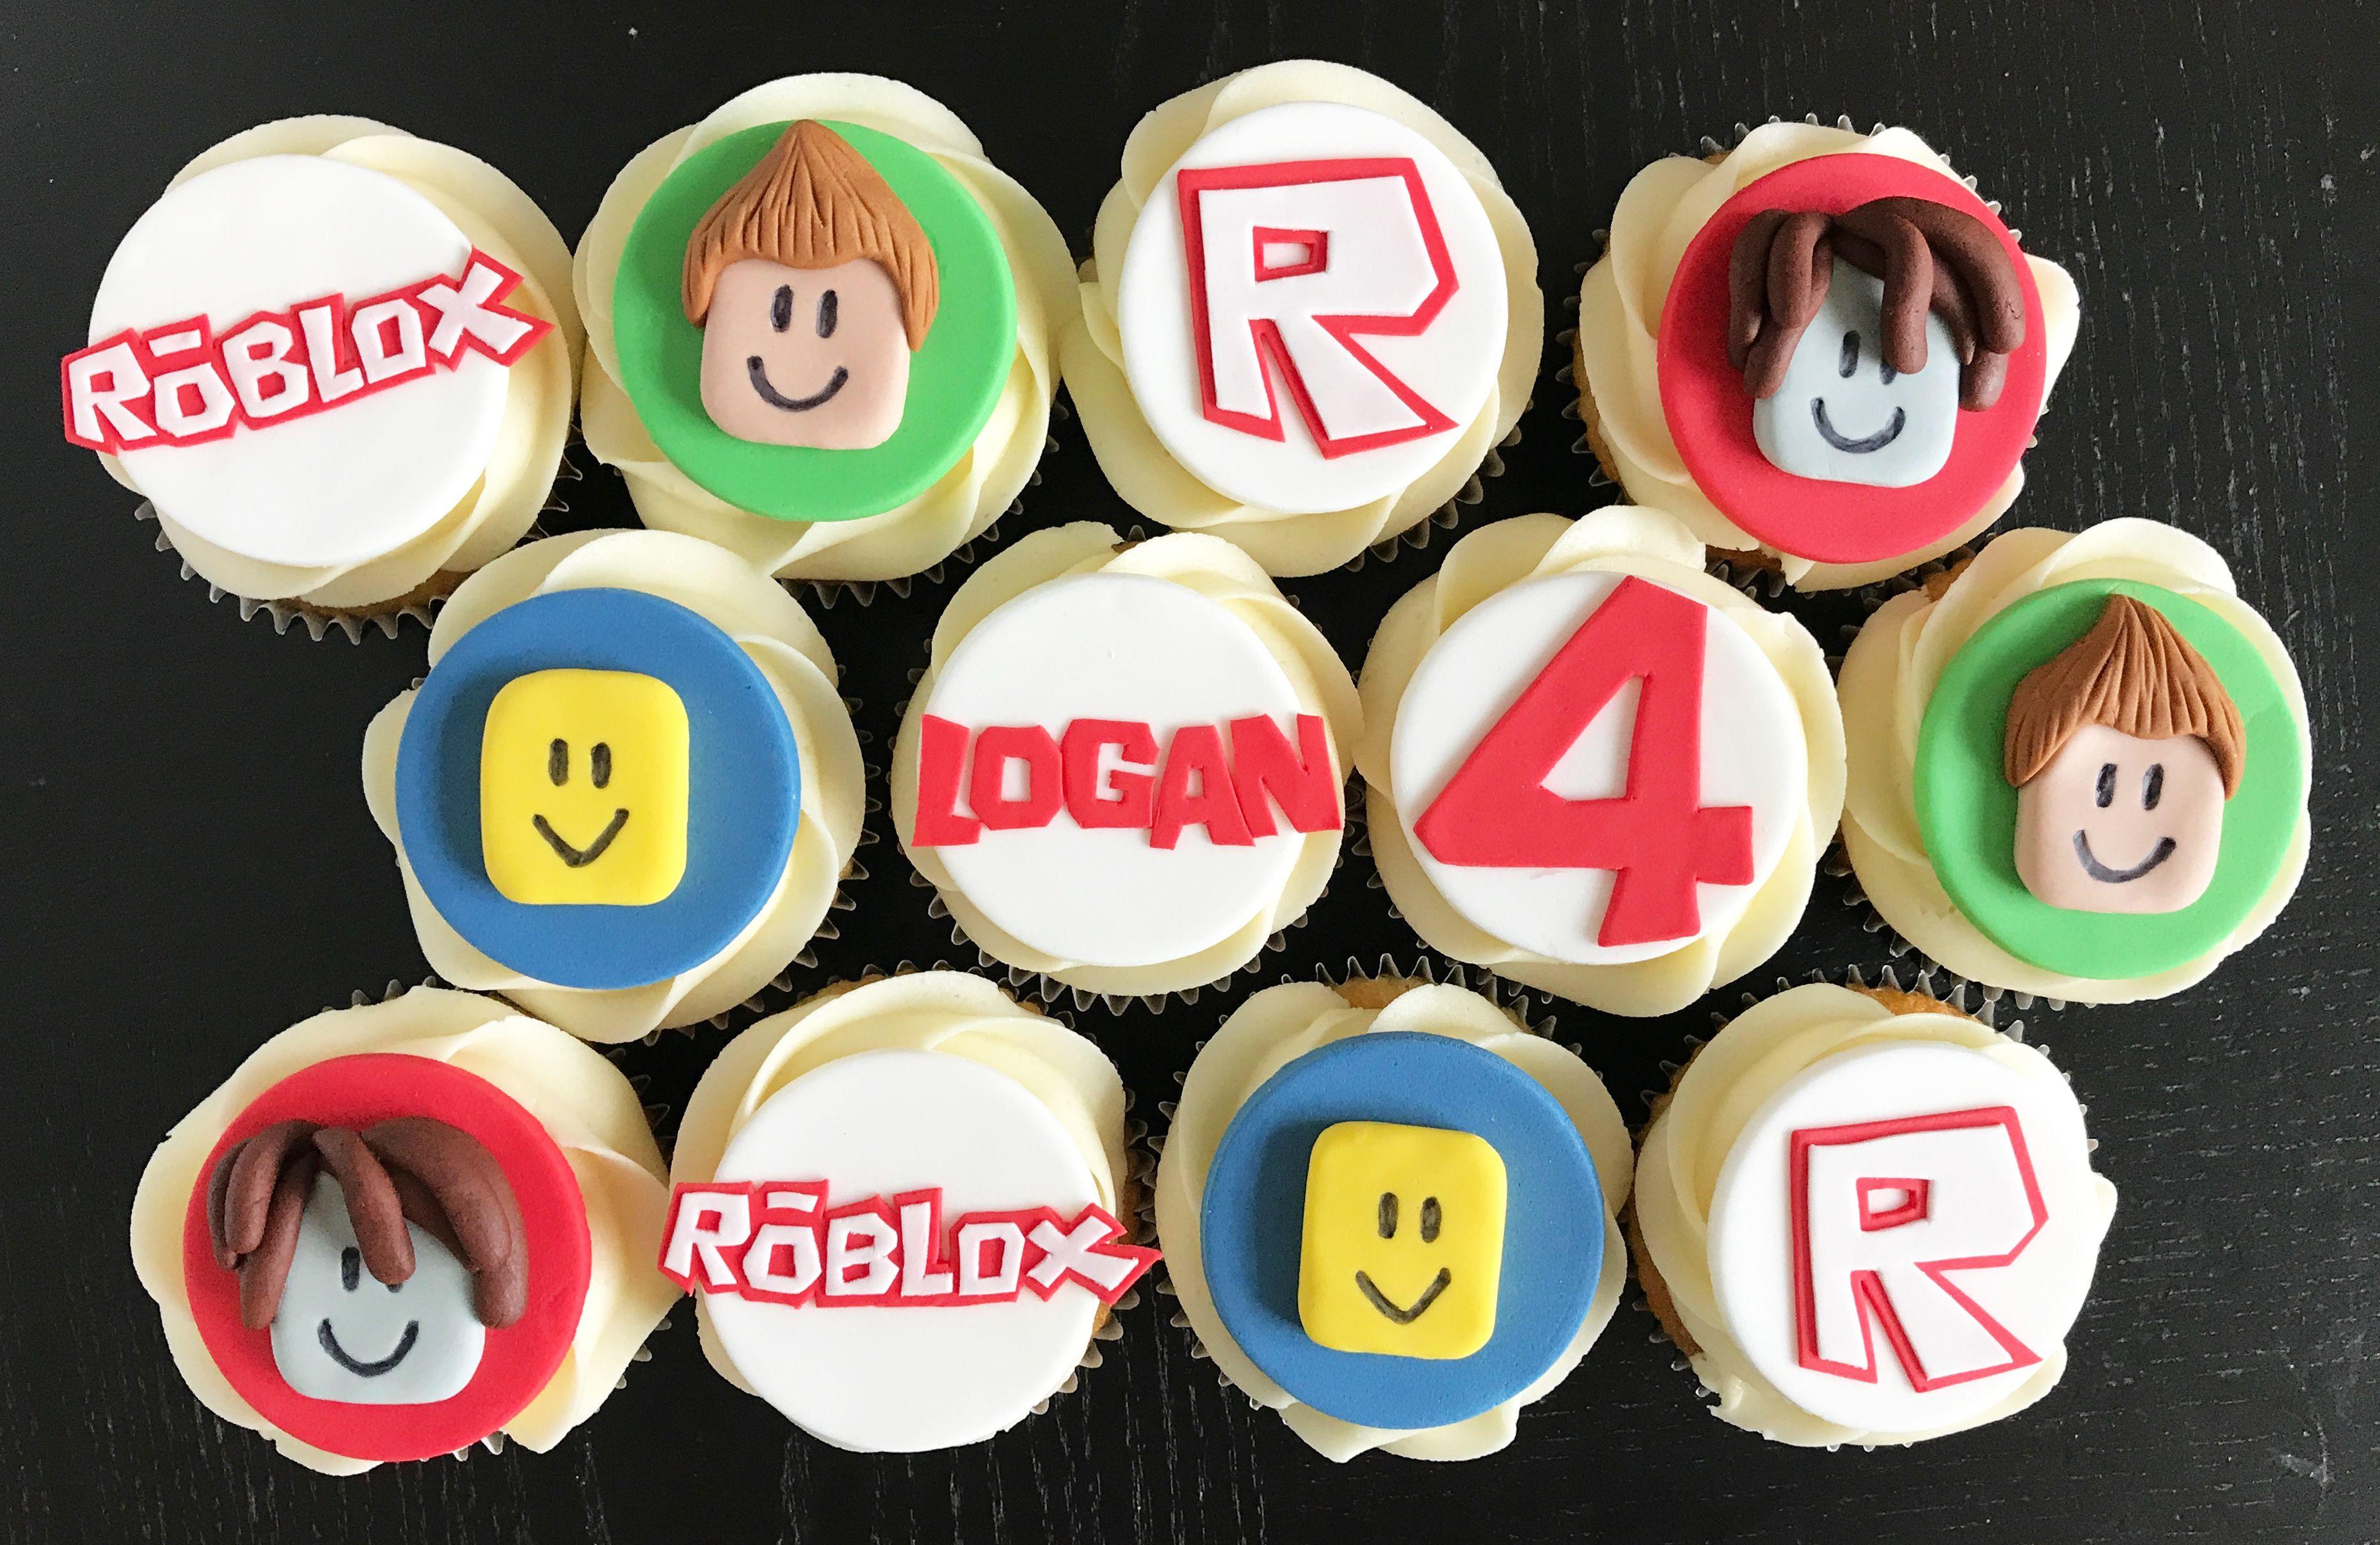 Roblox Cupcakes Decoracion Fiesta Cumpleanos Fiesta Cumpleanos